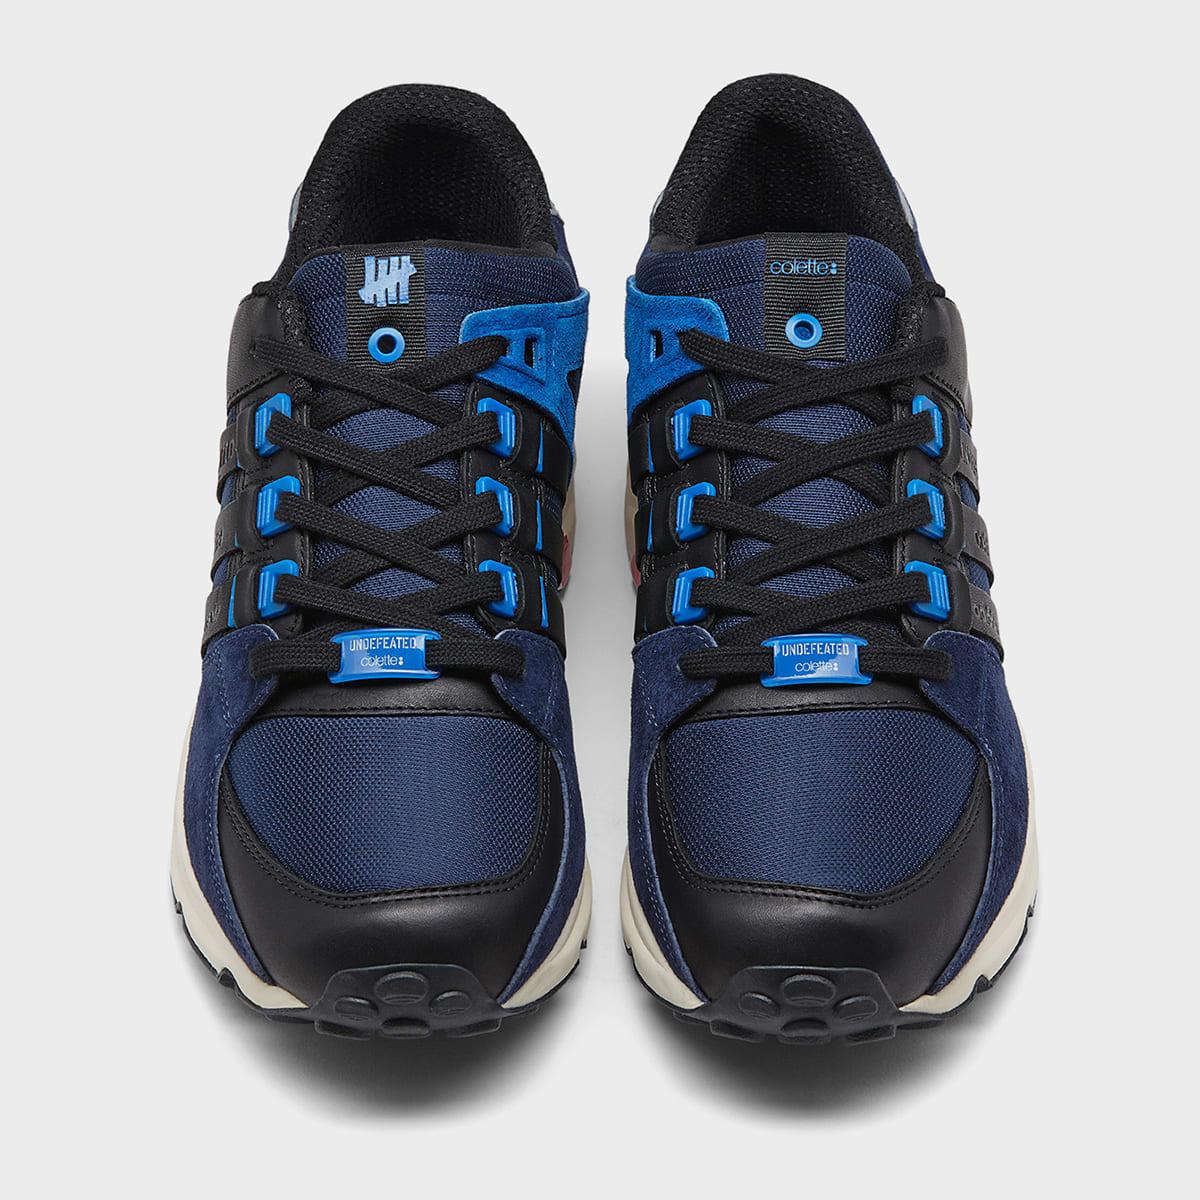 new concept 31e2d a1567 Adidas Consortium x Colette x UNDFTD EQT Support S.E.